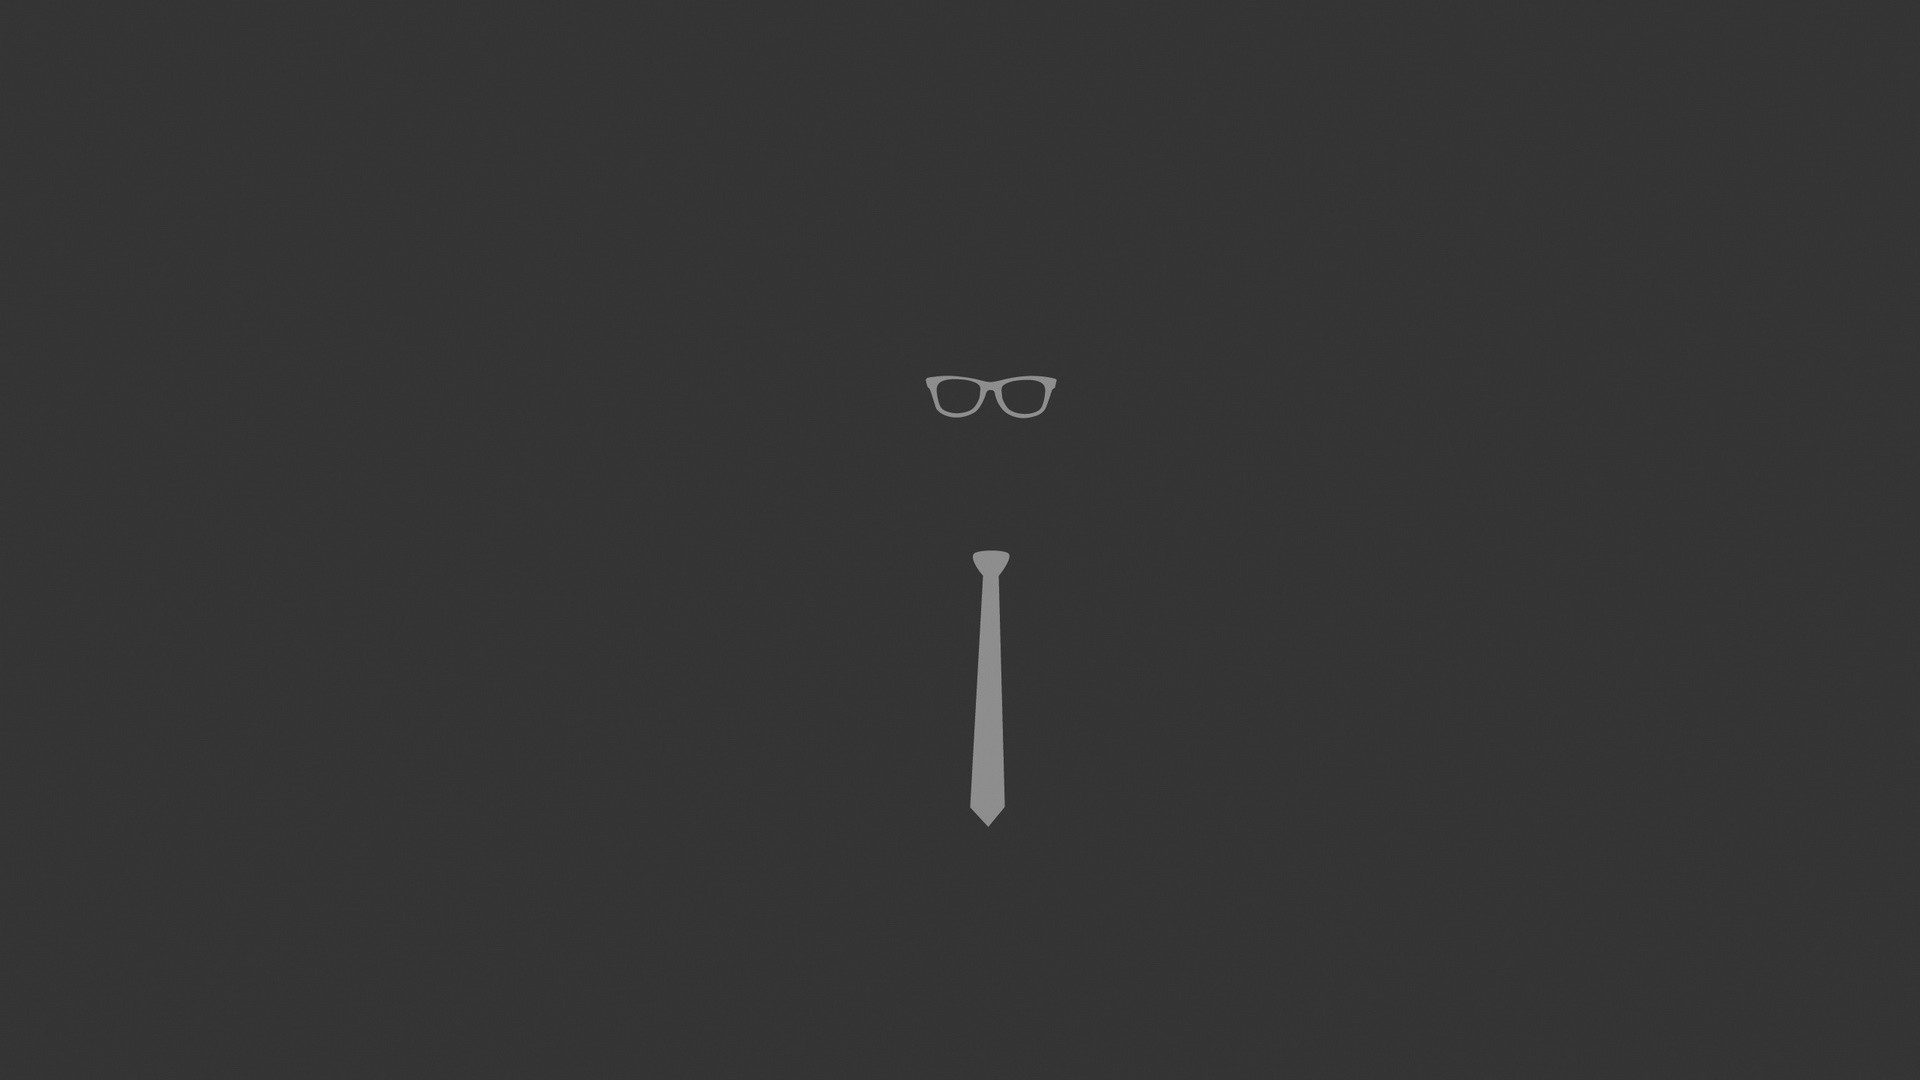 Tie, Glasses, Graphic, Minimalist Wallpaper, Background Full HD 1080p .